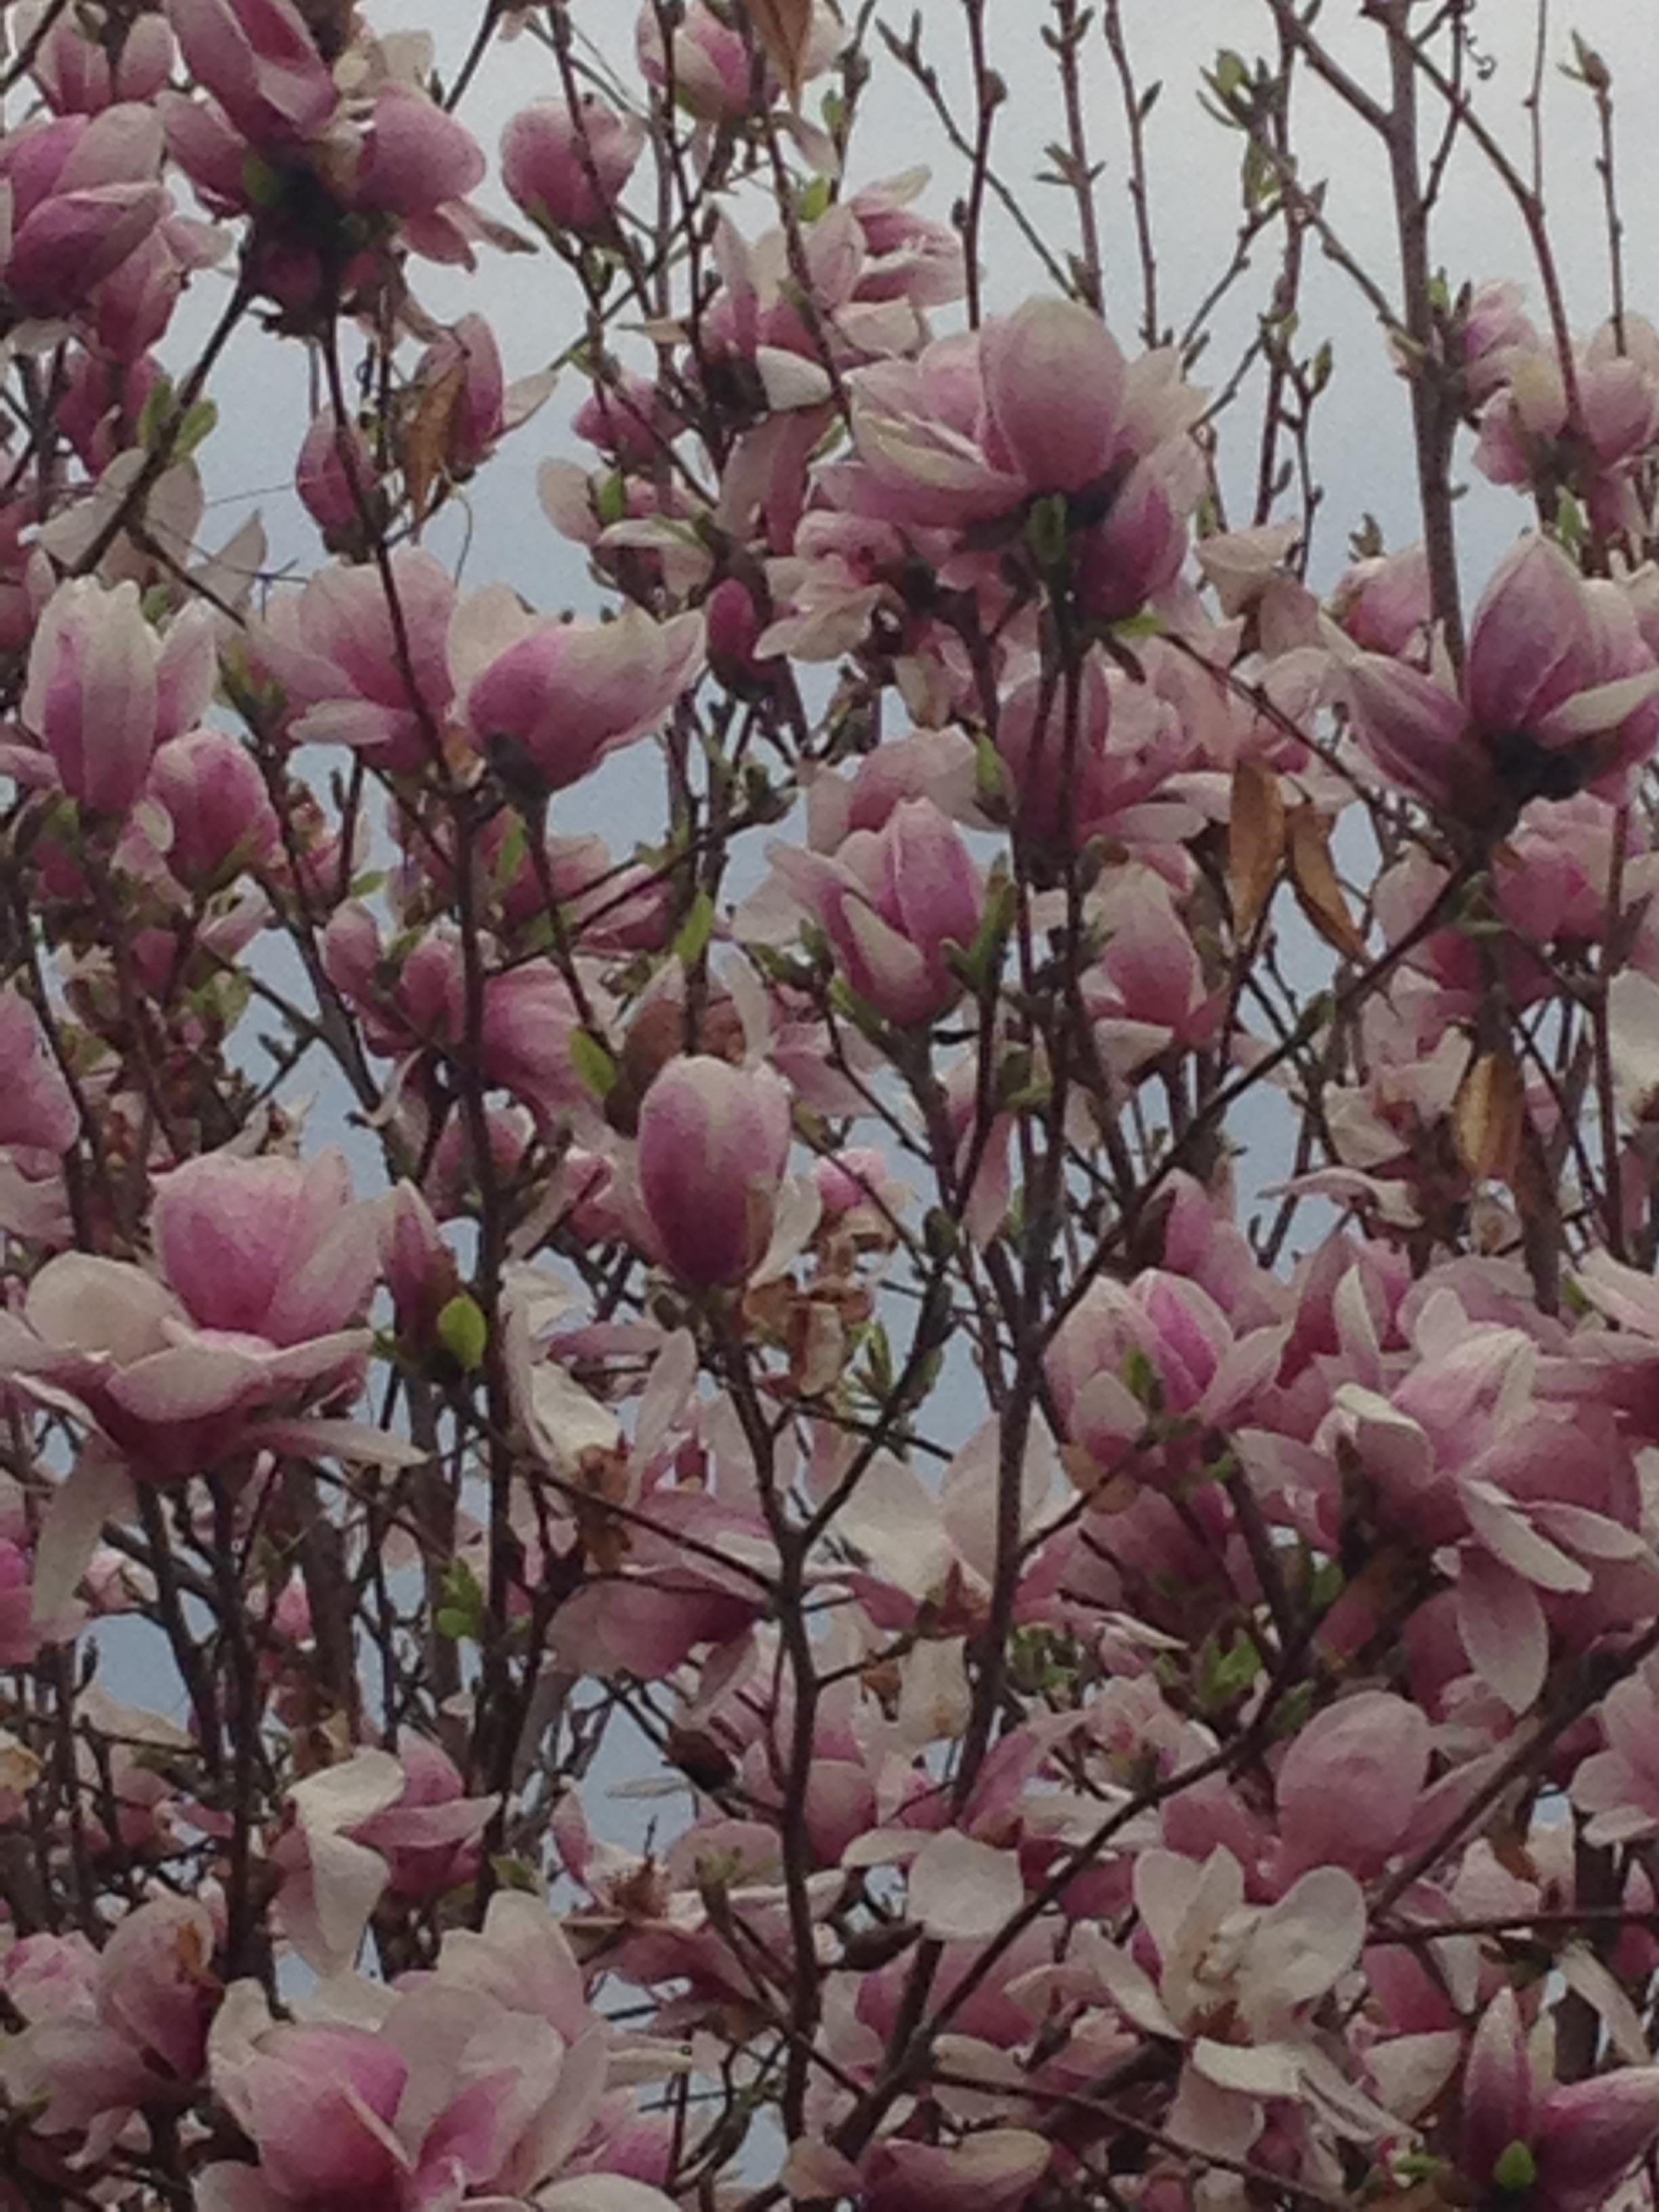 Magnolia tree in the garden